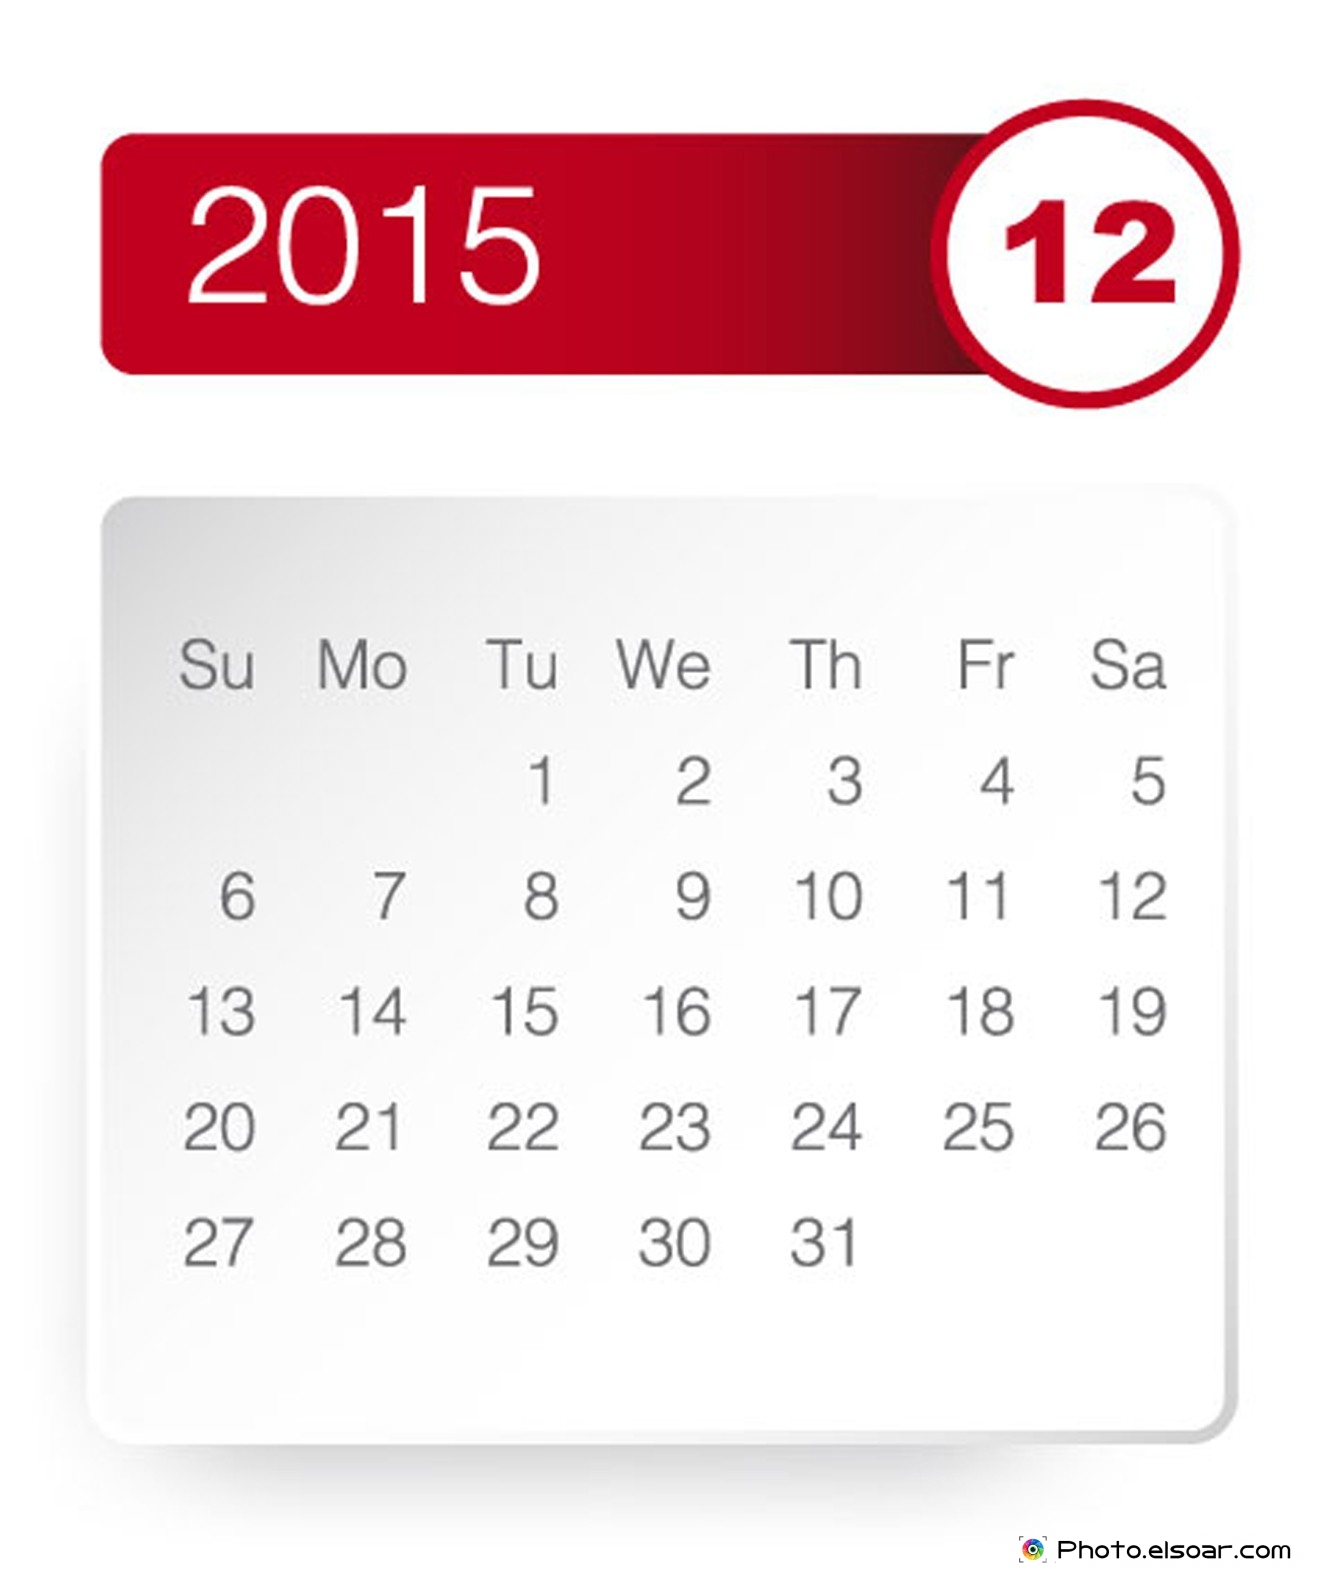 December 2015 calendar clipart jpg transparent library Free Printable 2015 Monthly Calendar • Elsoar jpg transparent library